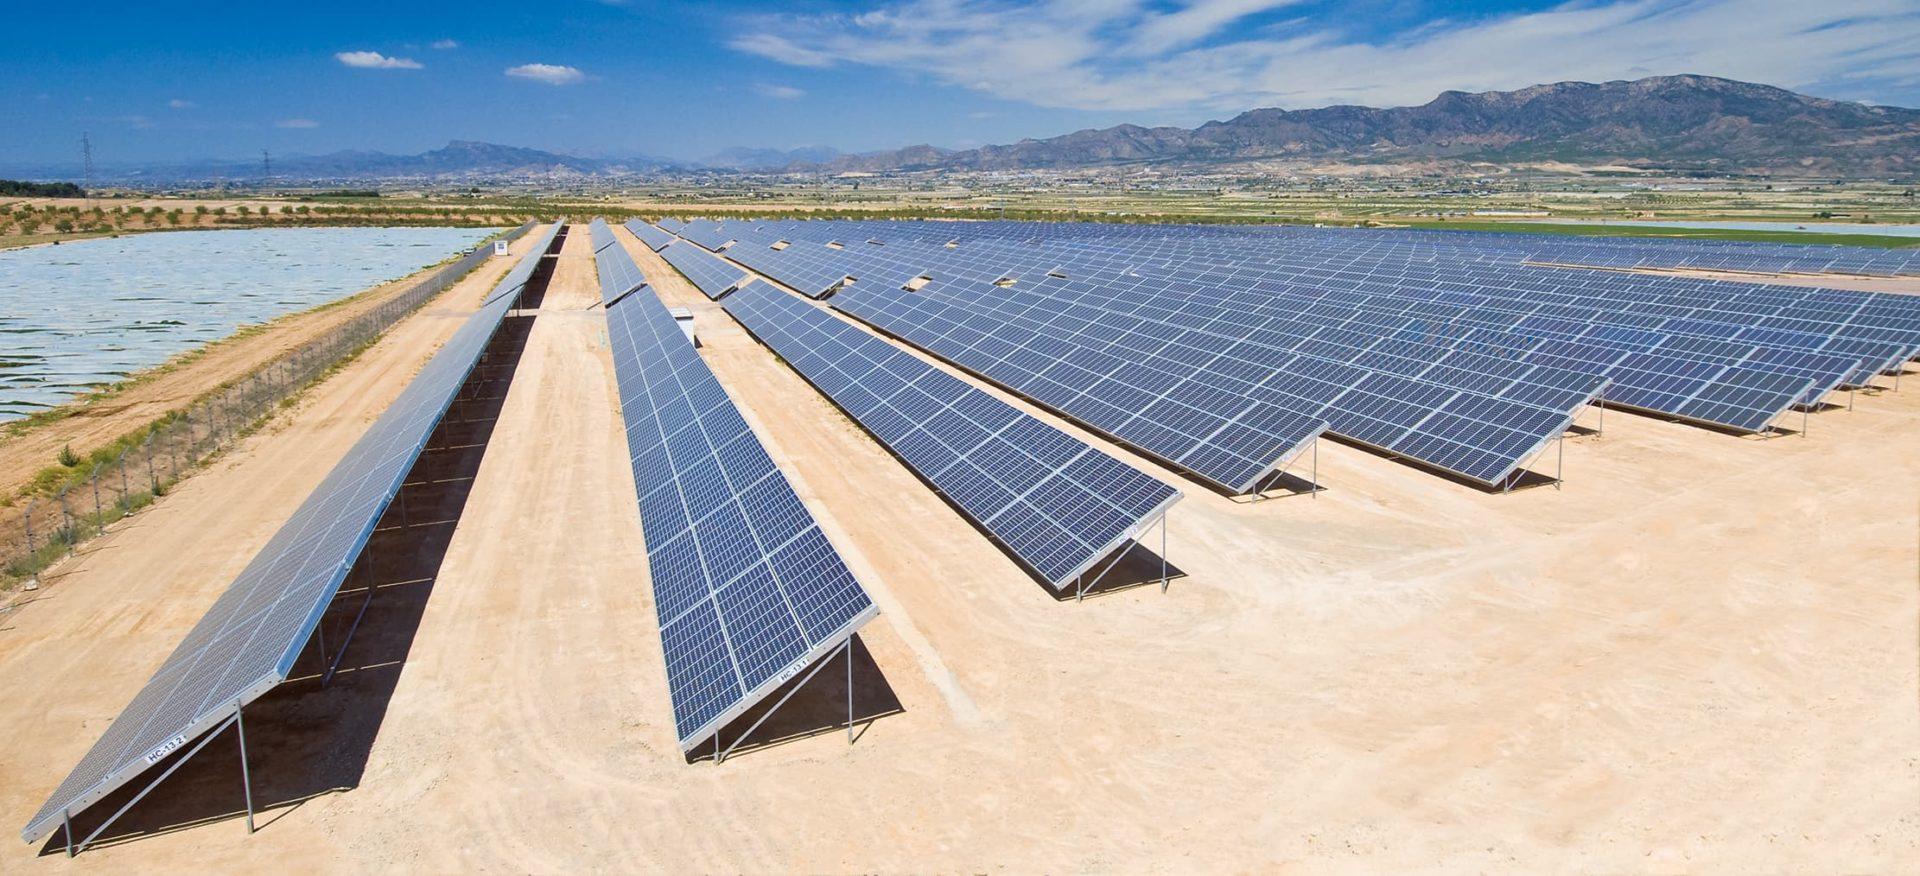 Solarpark NEEC in Murcia, Spanien